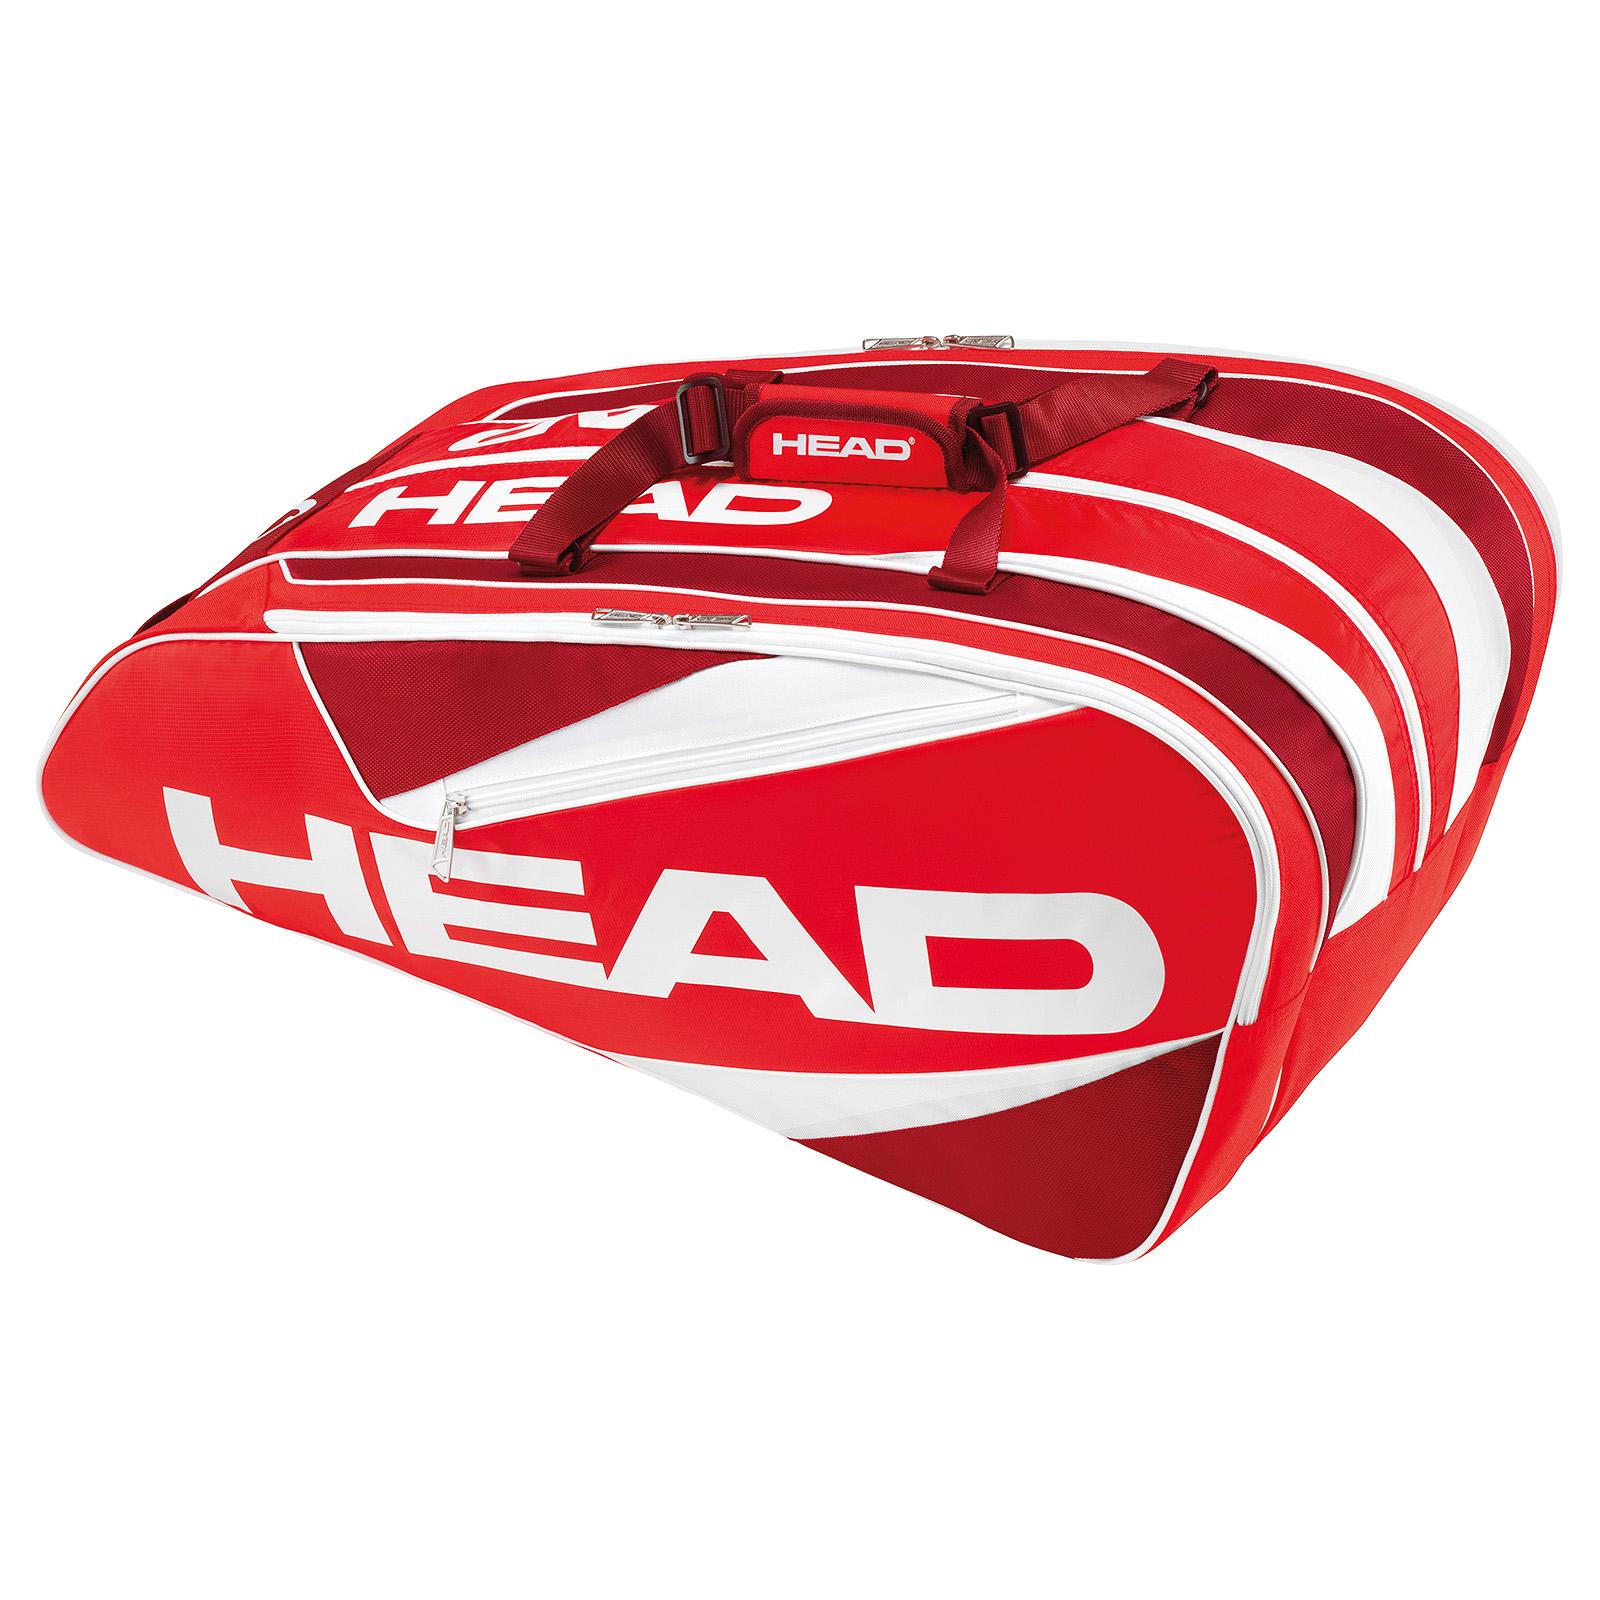 HEAD Elite Monstercombi 12R Red